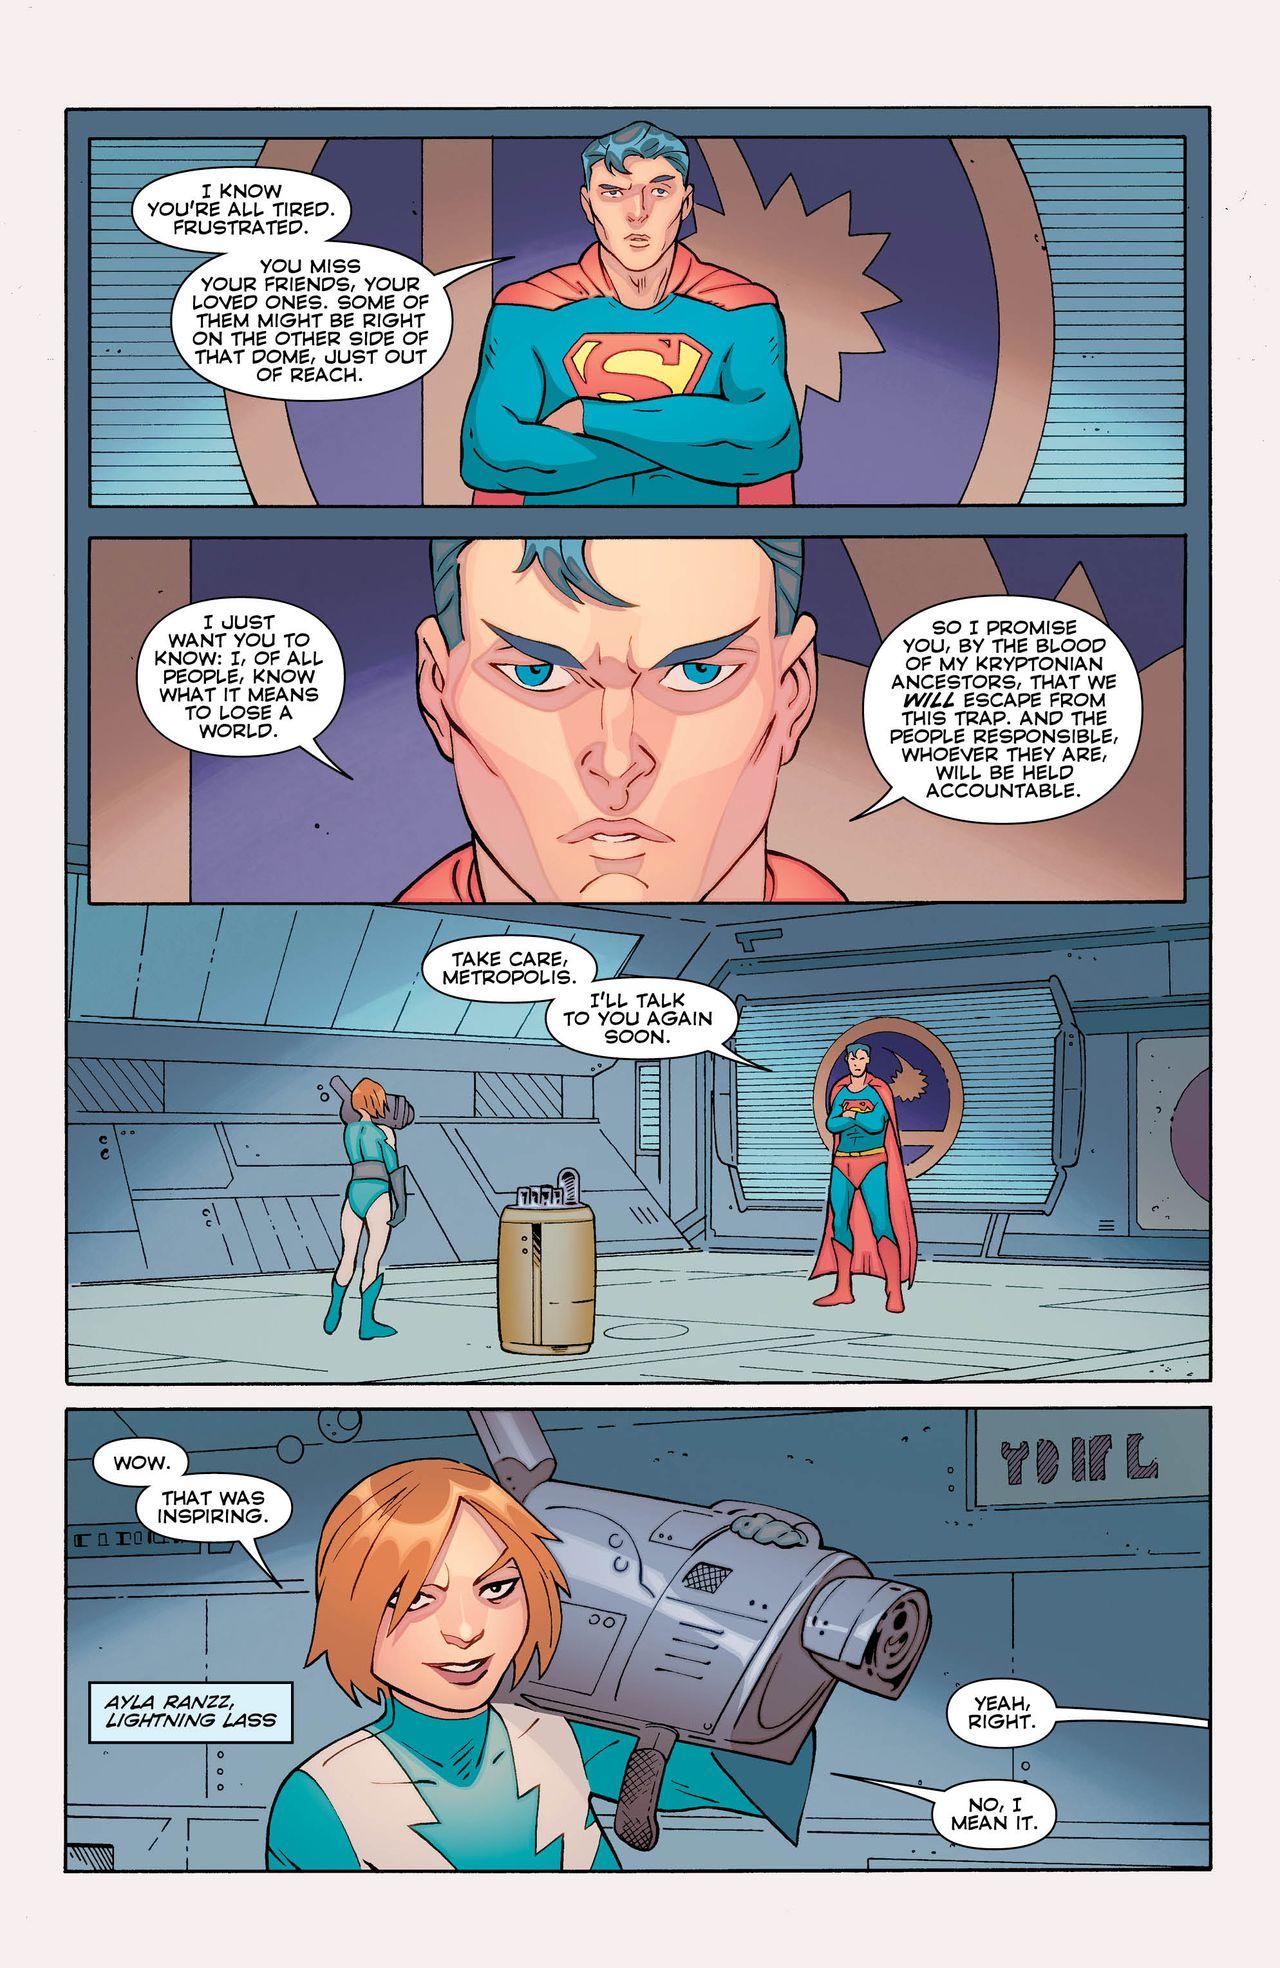 Superboys Legion HD wallpapers, Desktop wallpaper - most viewed